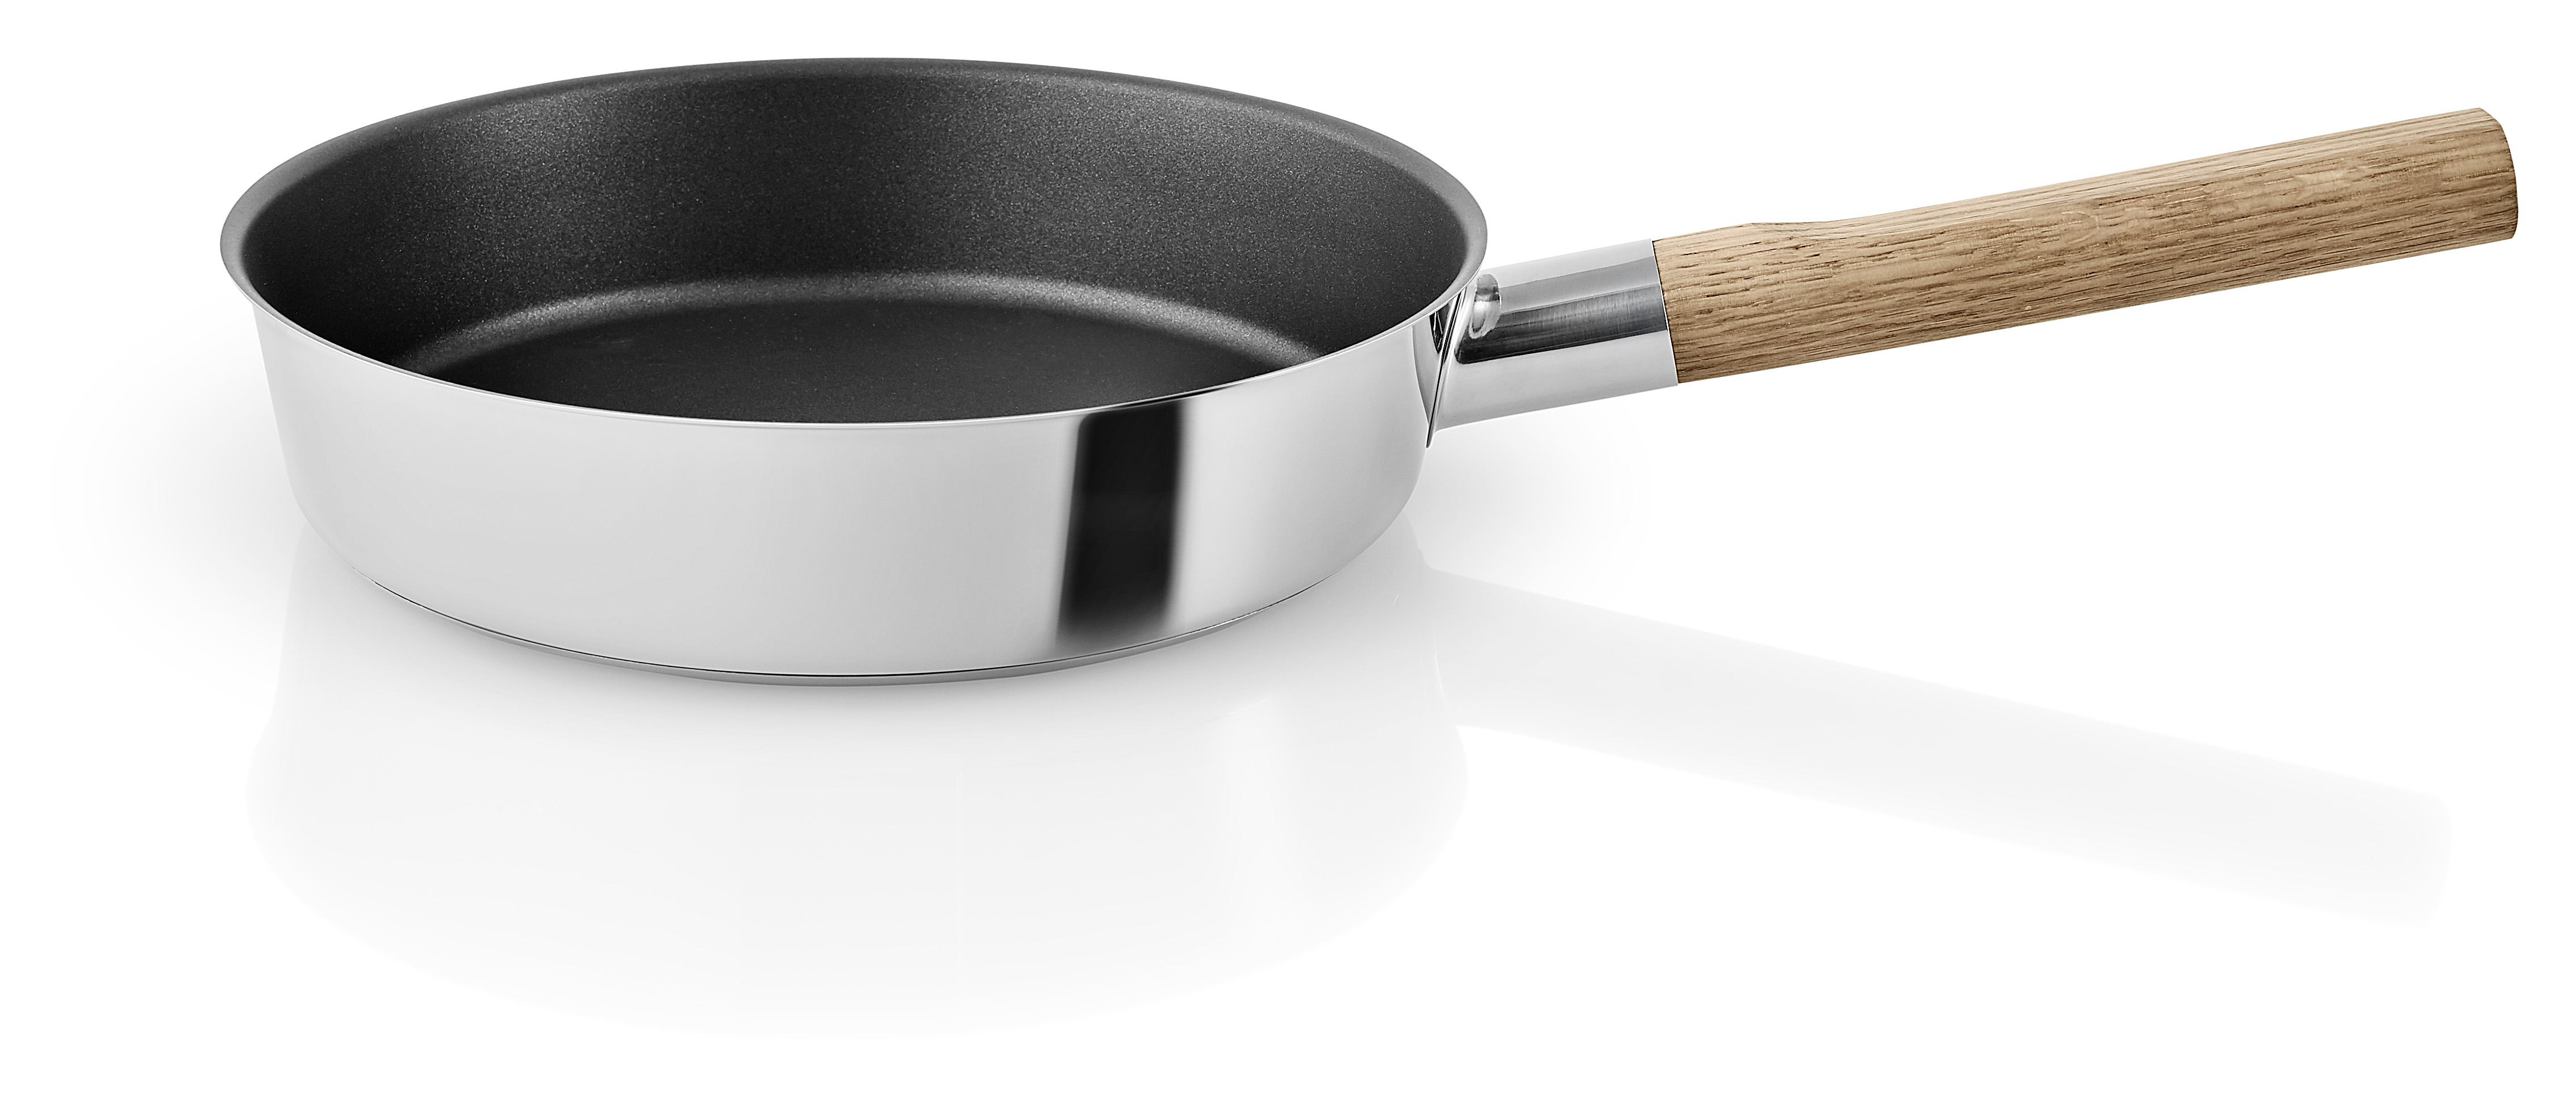 Eva Solo - Nordic Kitchen Frying Pan 24 cm (281324)